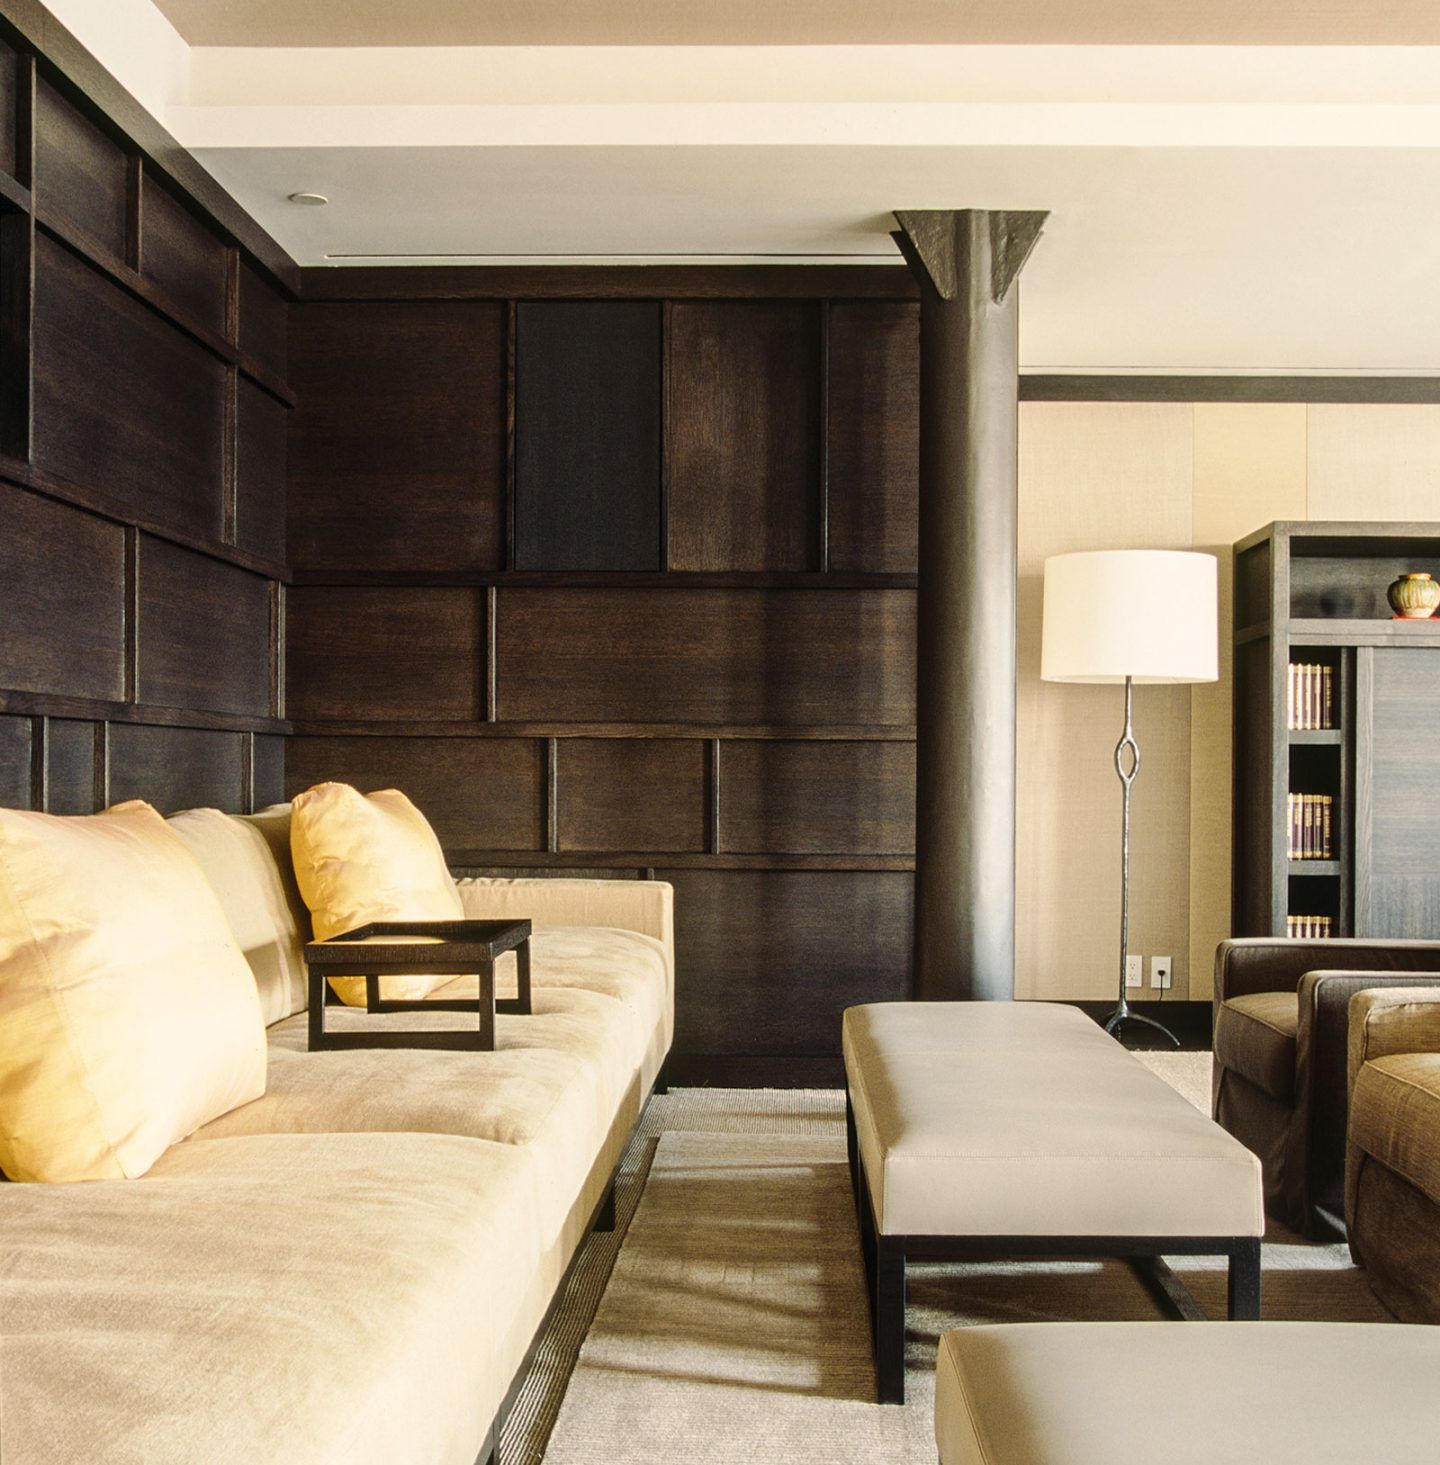 Living Room Furniture Nyc: Résidences Privées